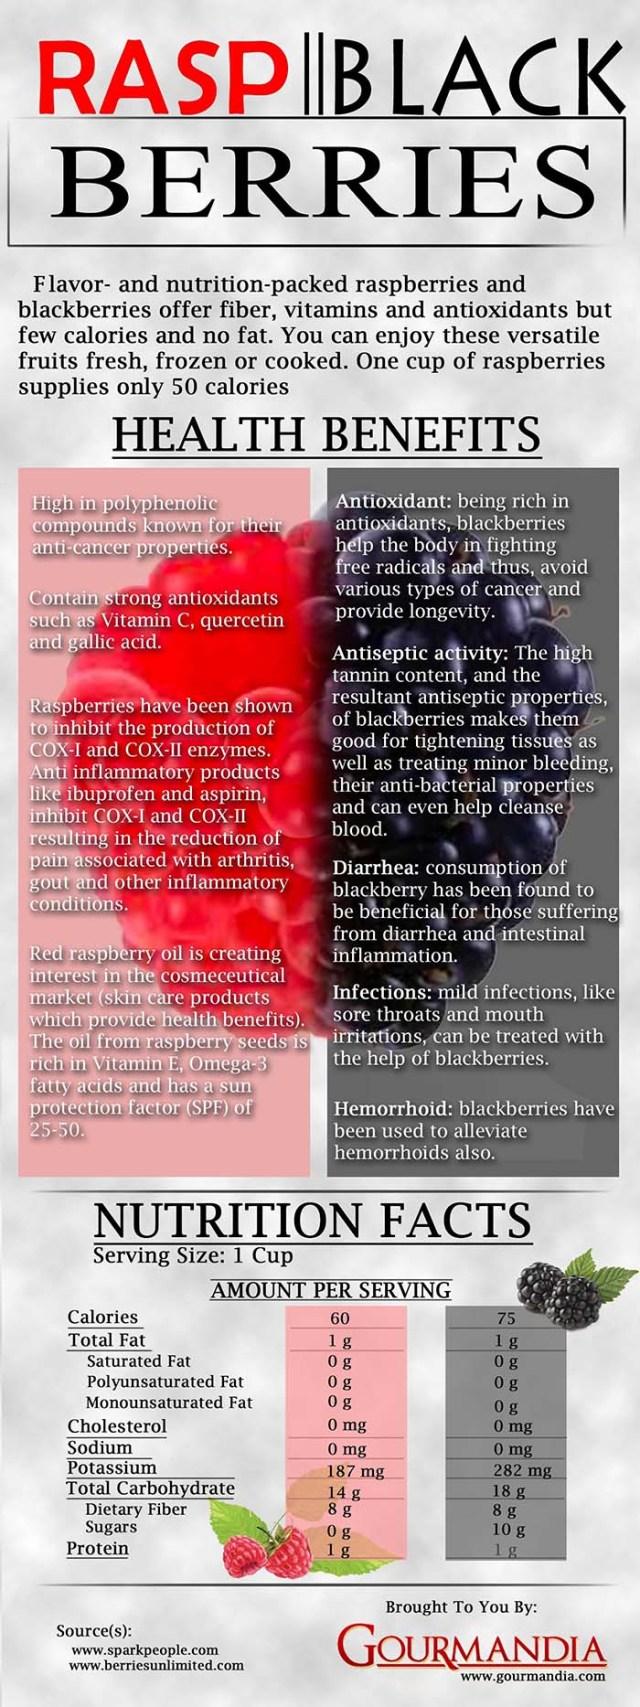 Benefits of feeding raspberries to dogs infographic